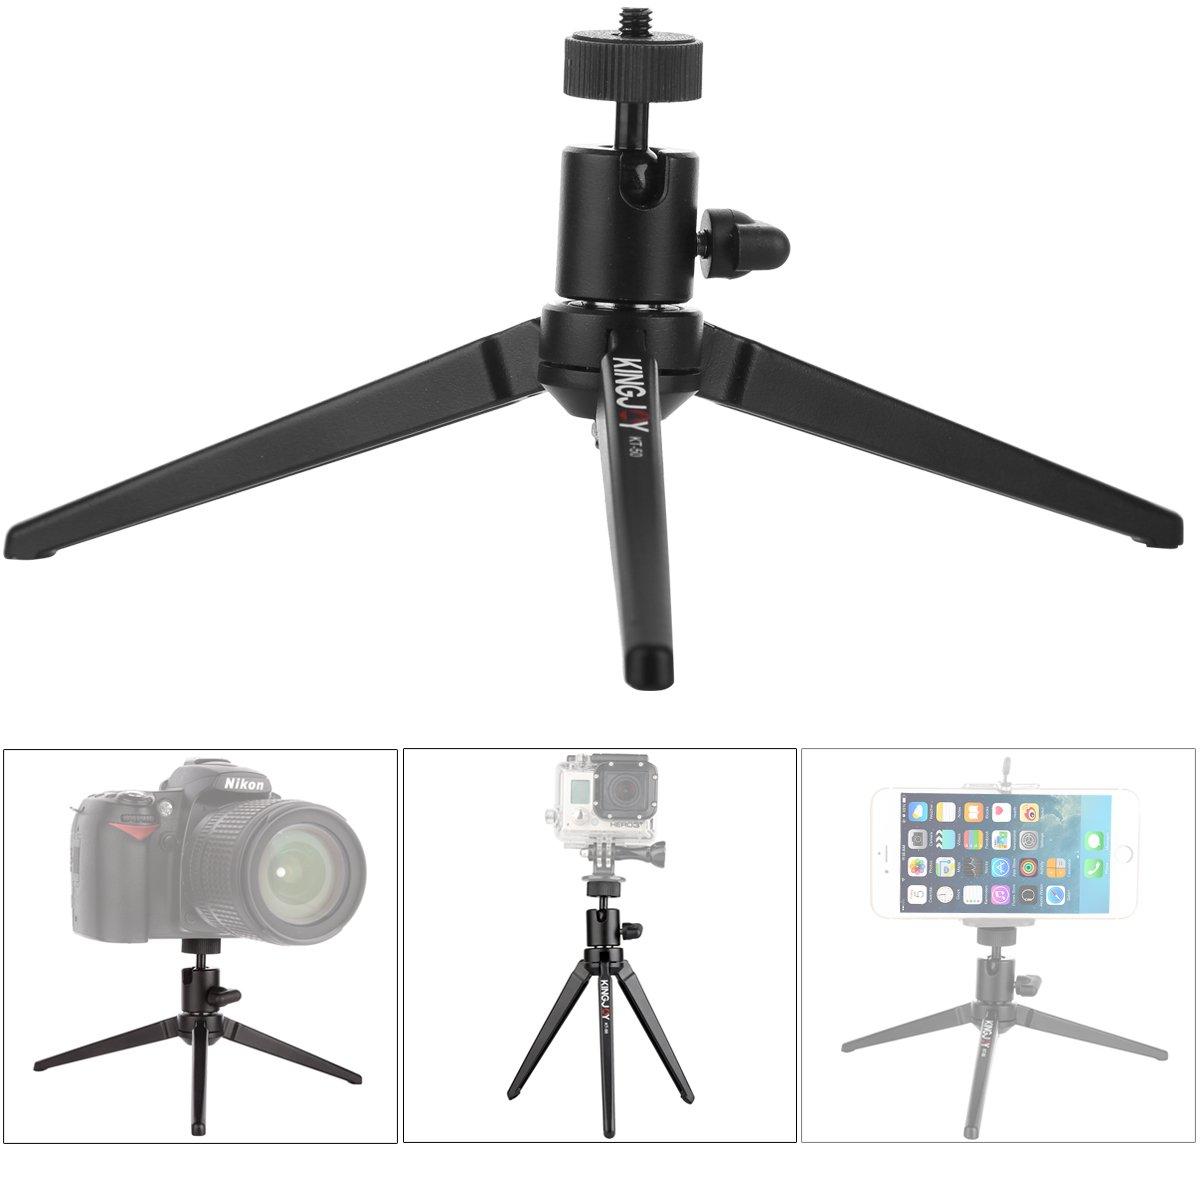 Mini Tabletop Portable Mini Webcam Tripod Legs Stand with Swivel Ball Head for Logitech Webcam C920 C922 DSLR Digital Camera Spotting Scope Projector